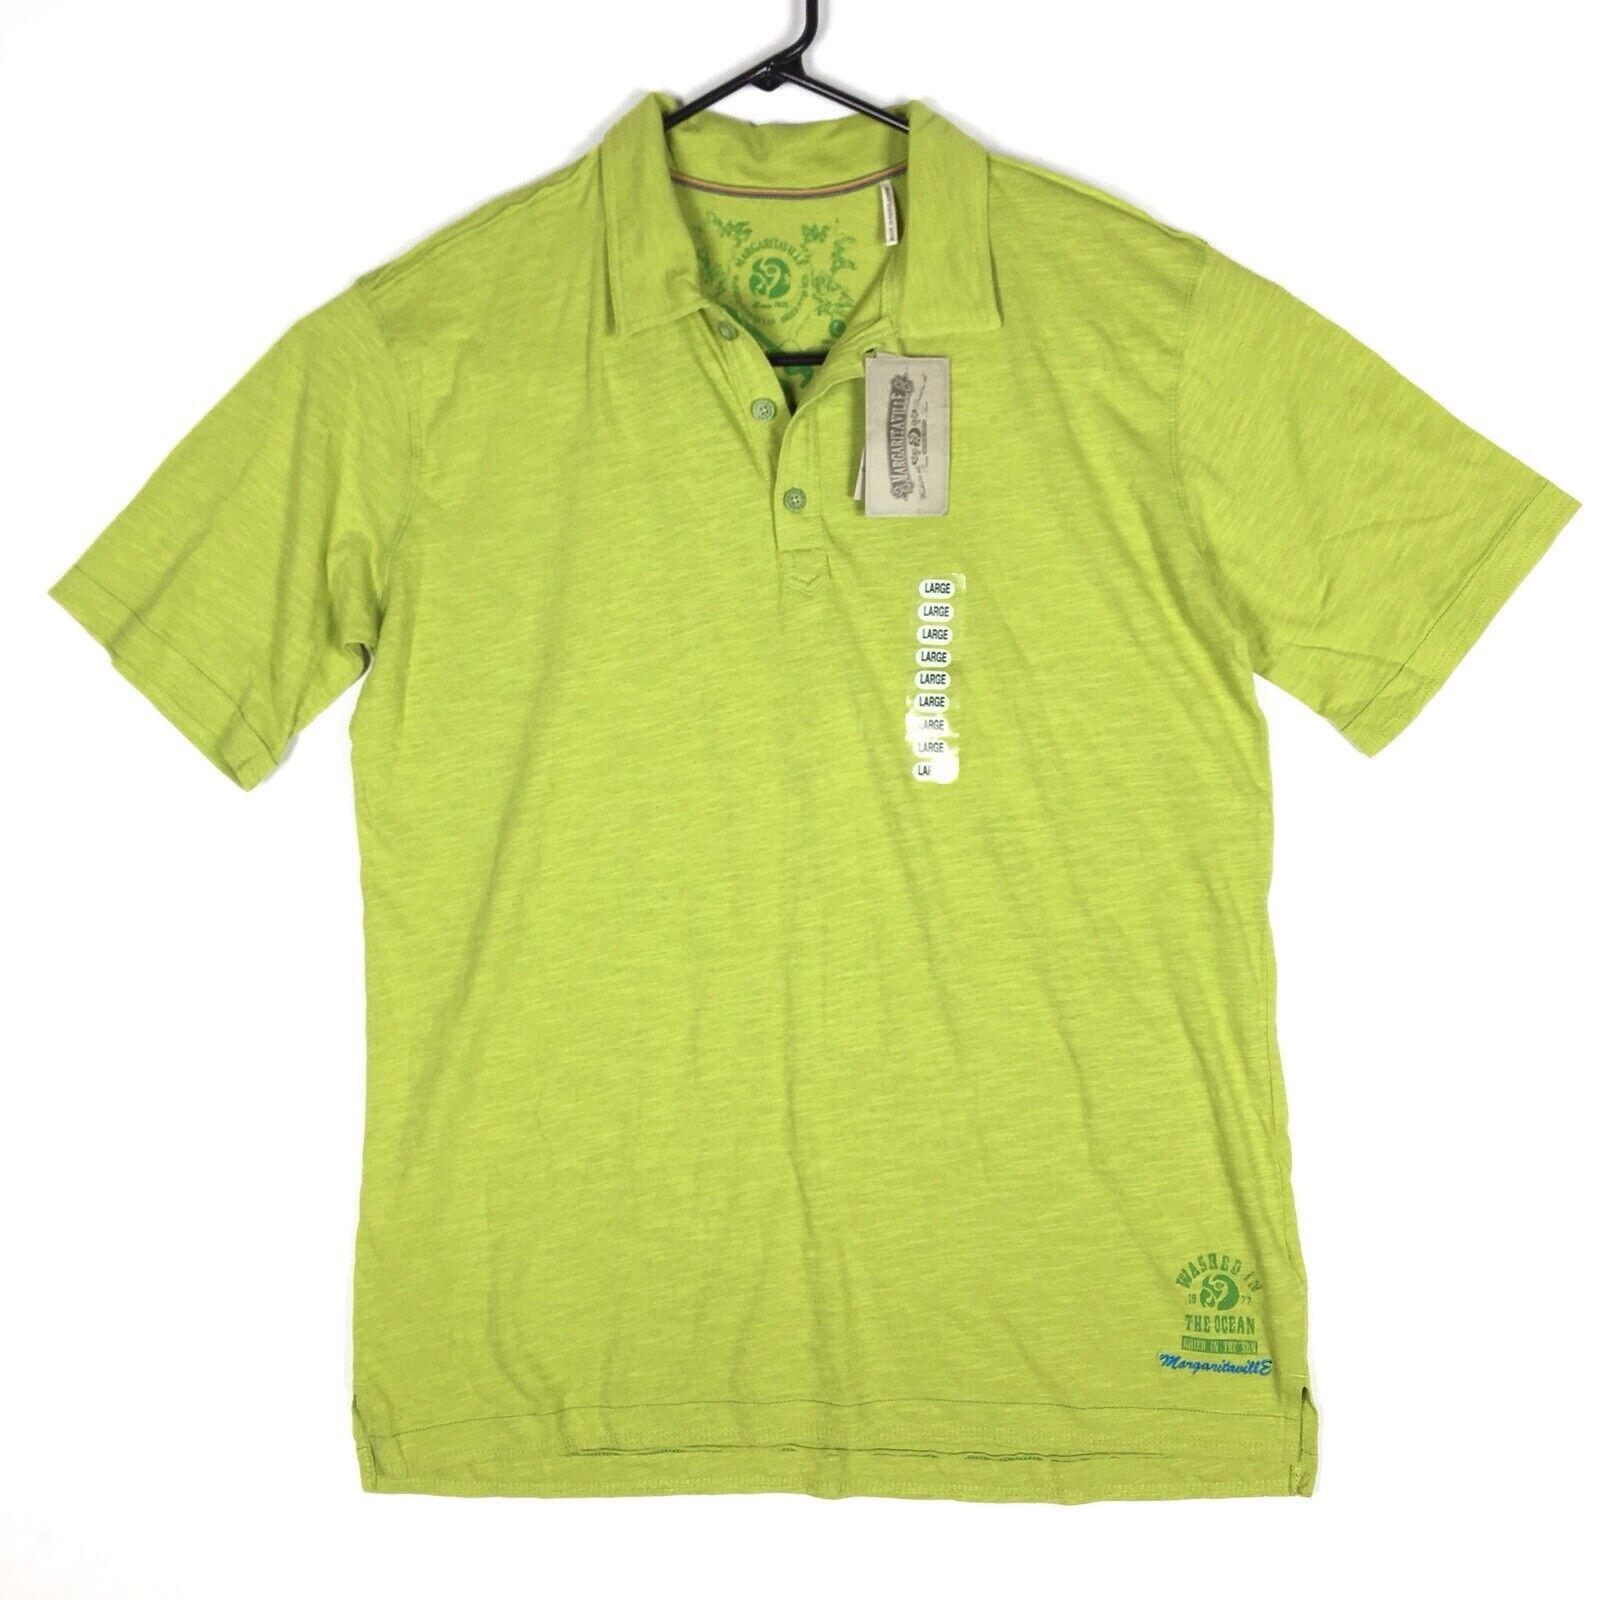 Margaritaville Men's Short Sleeve Polo Shirt Size Large Cotton Green